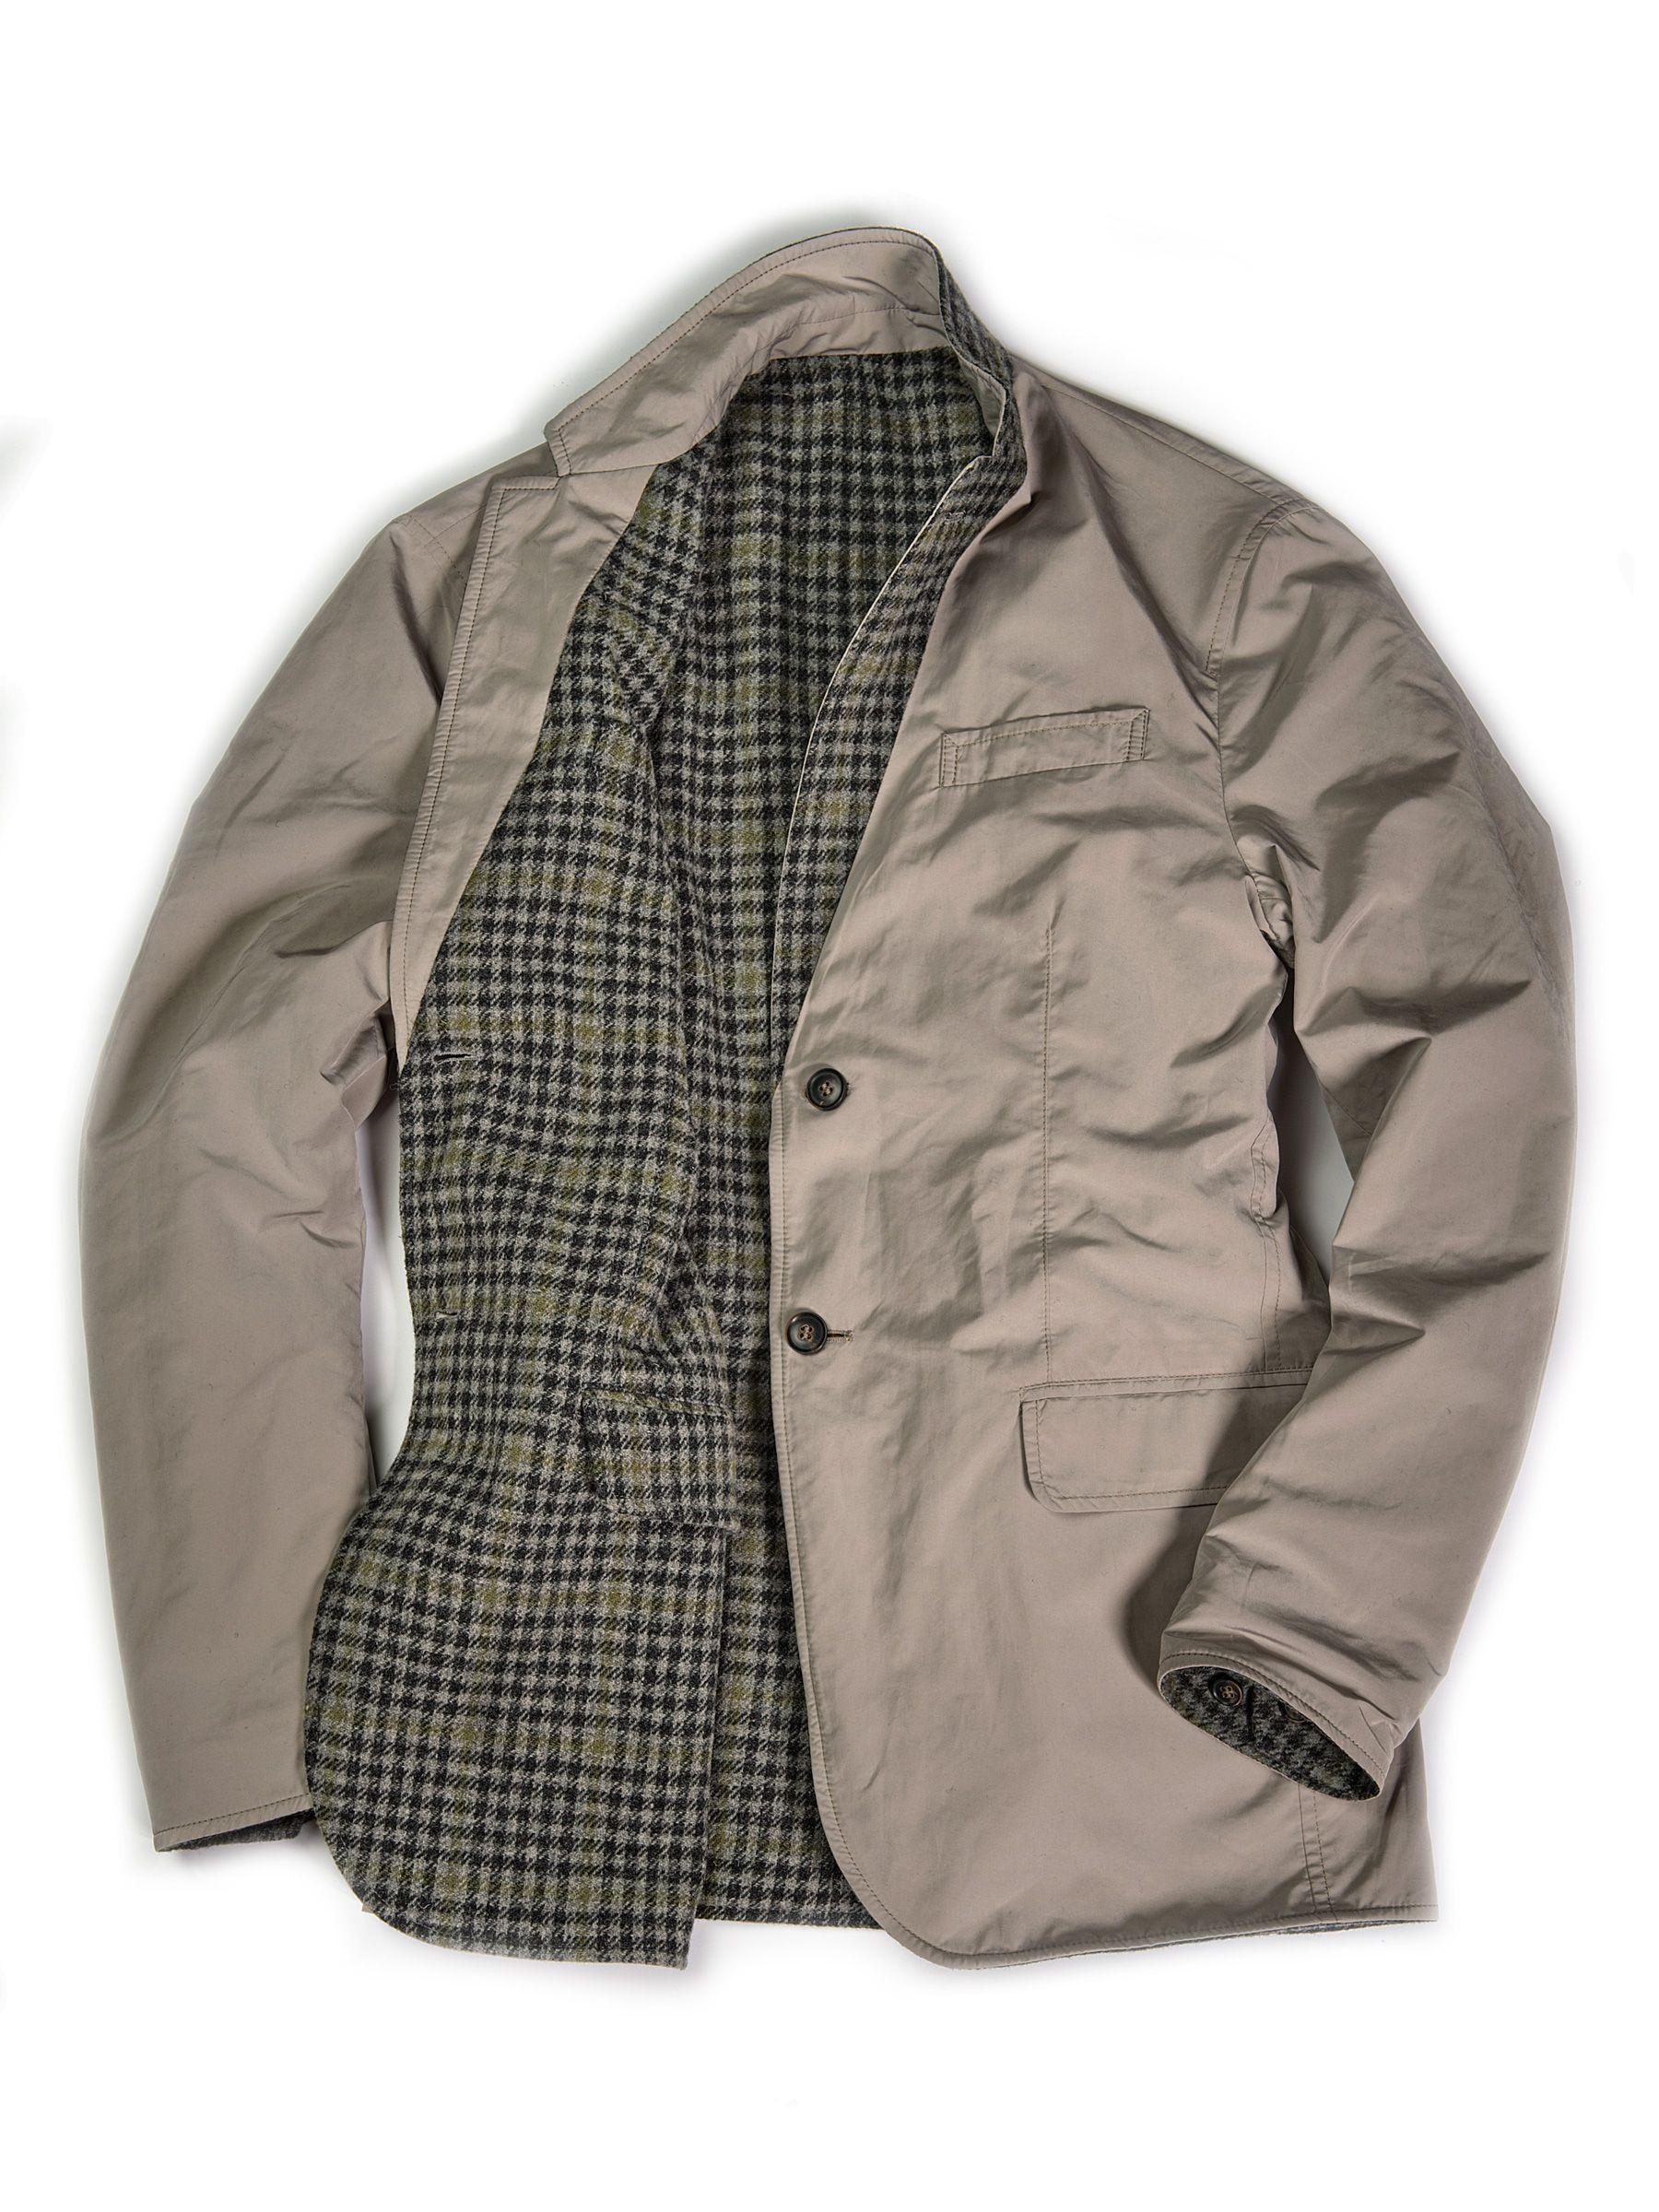 Reversible Sport Coat Smoke The Field Outfitting Company Sport Coat Outerwear Jackets Coat [ 2400 x 1800 Pixel ]